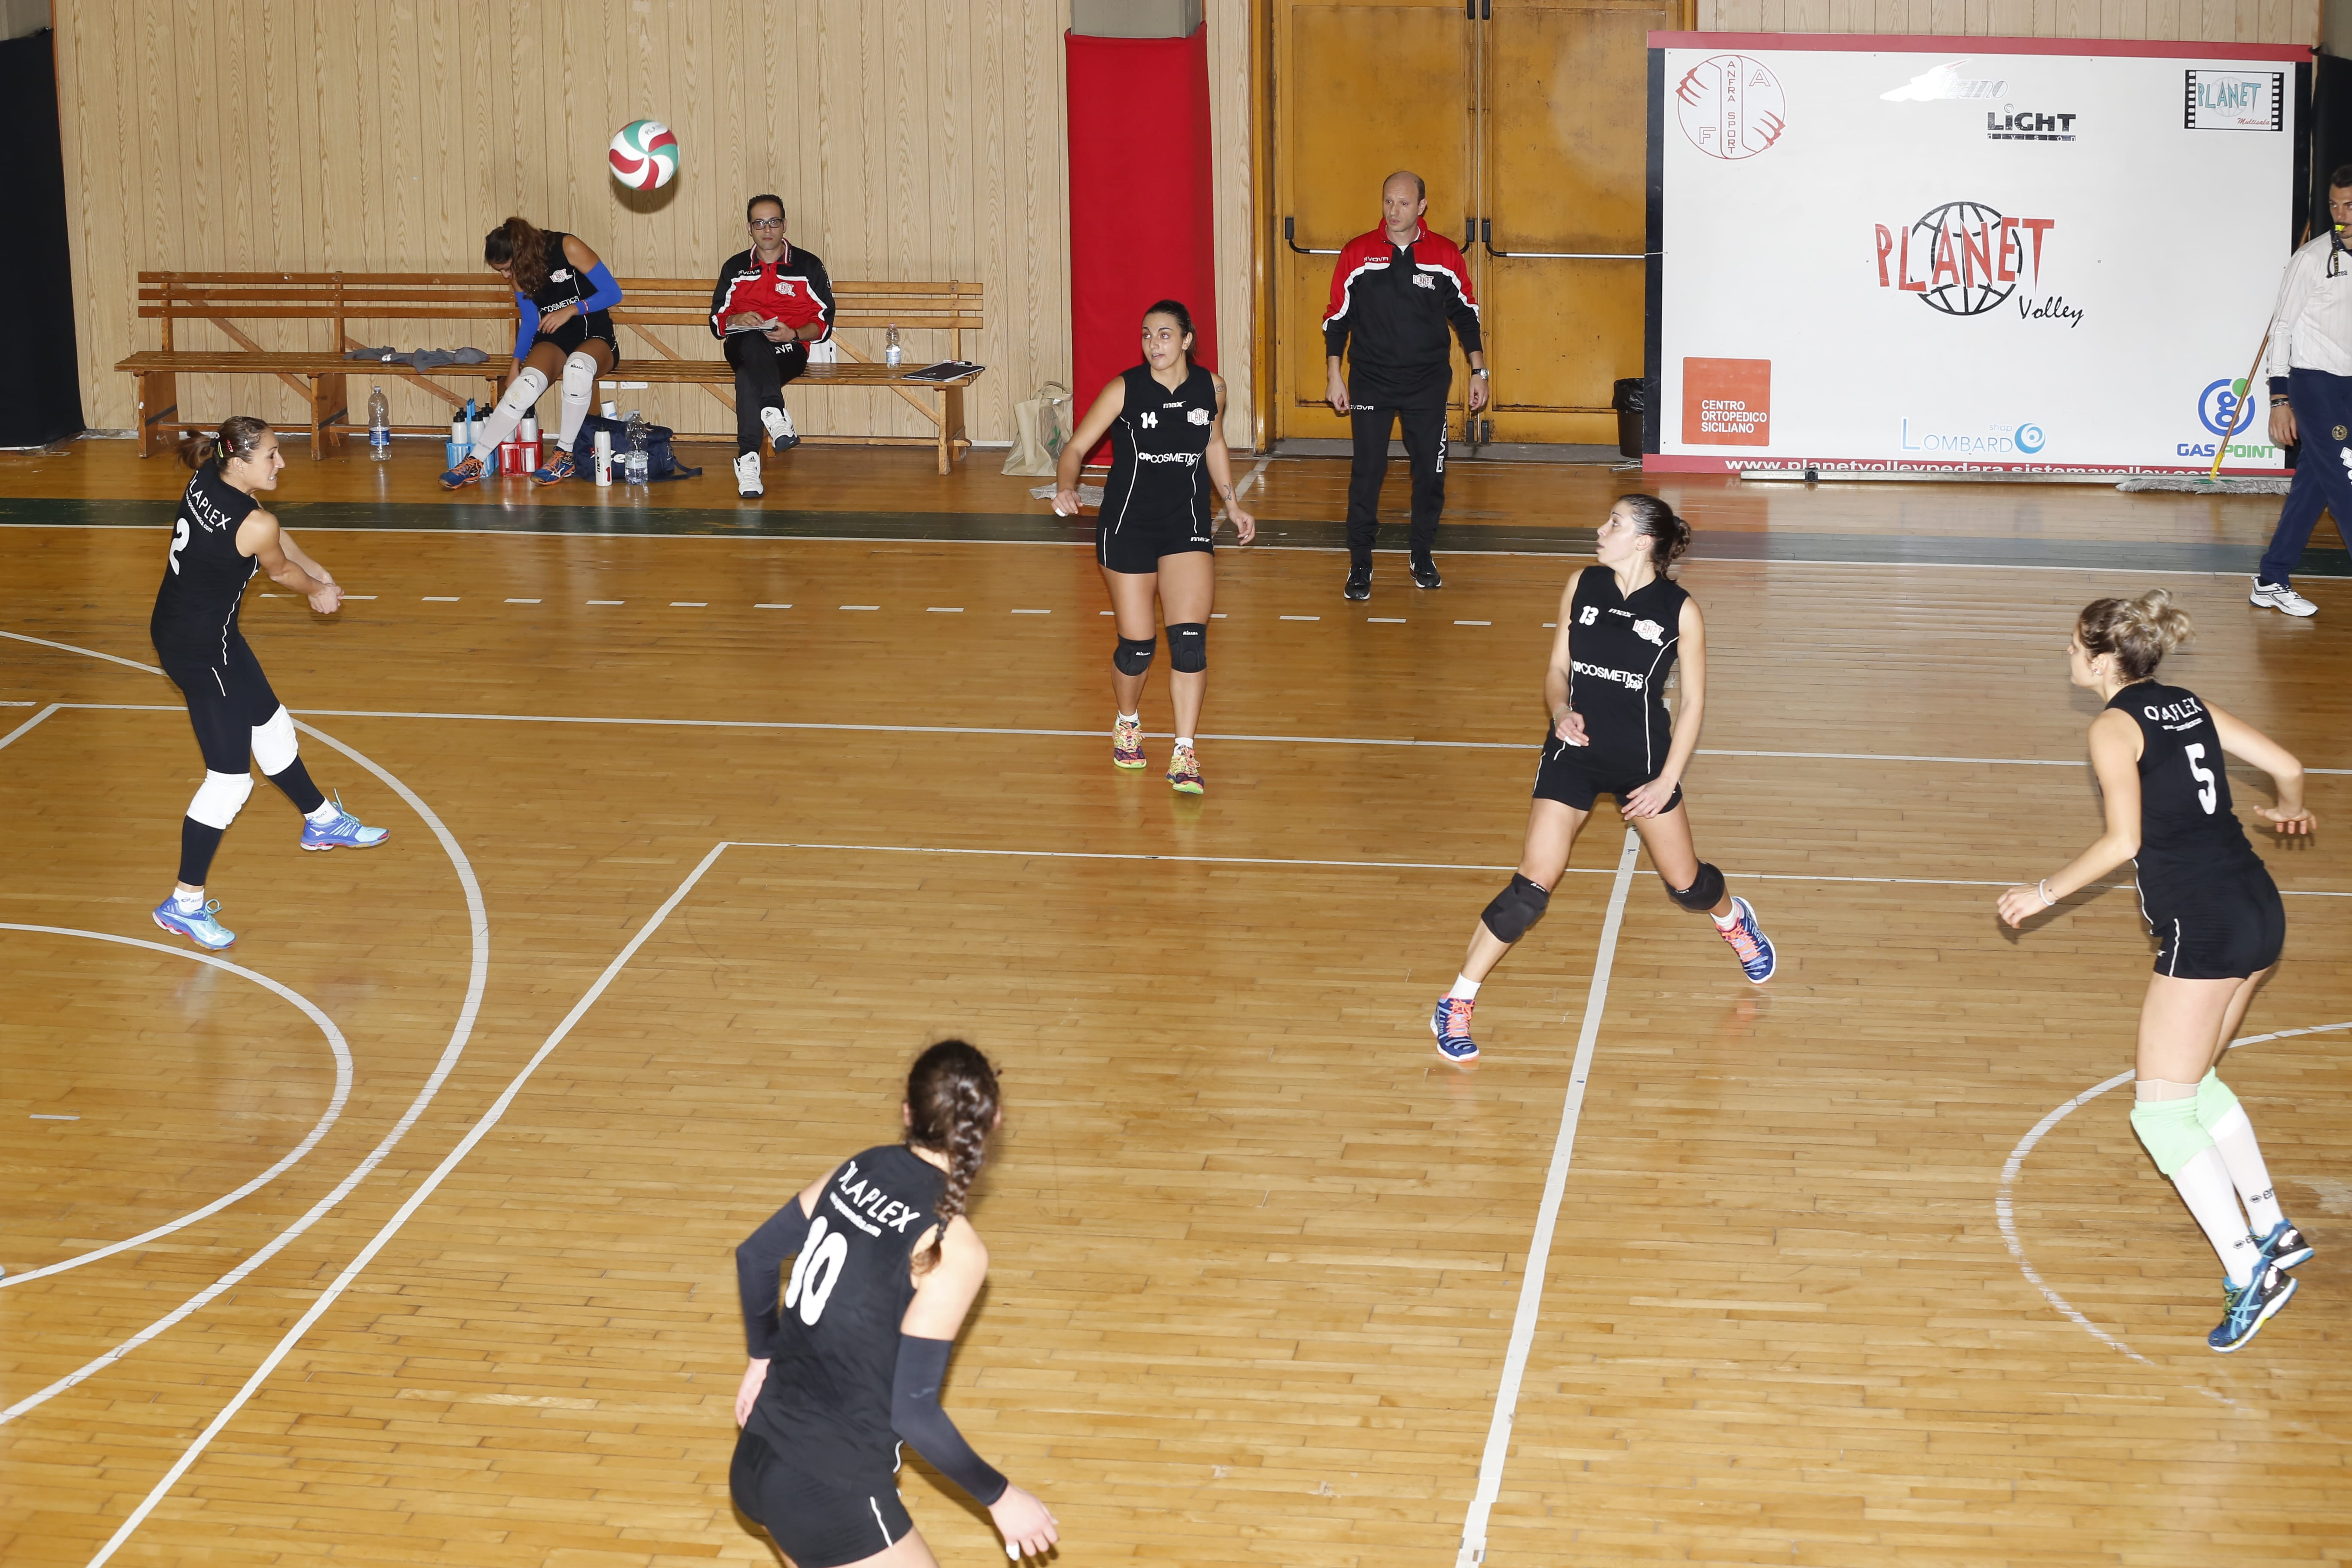 Partita 5 Planet Volley - OP e lo sport